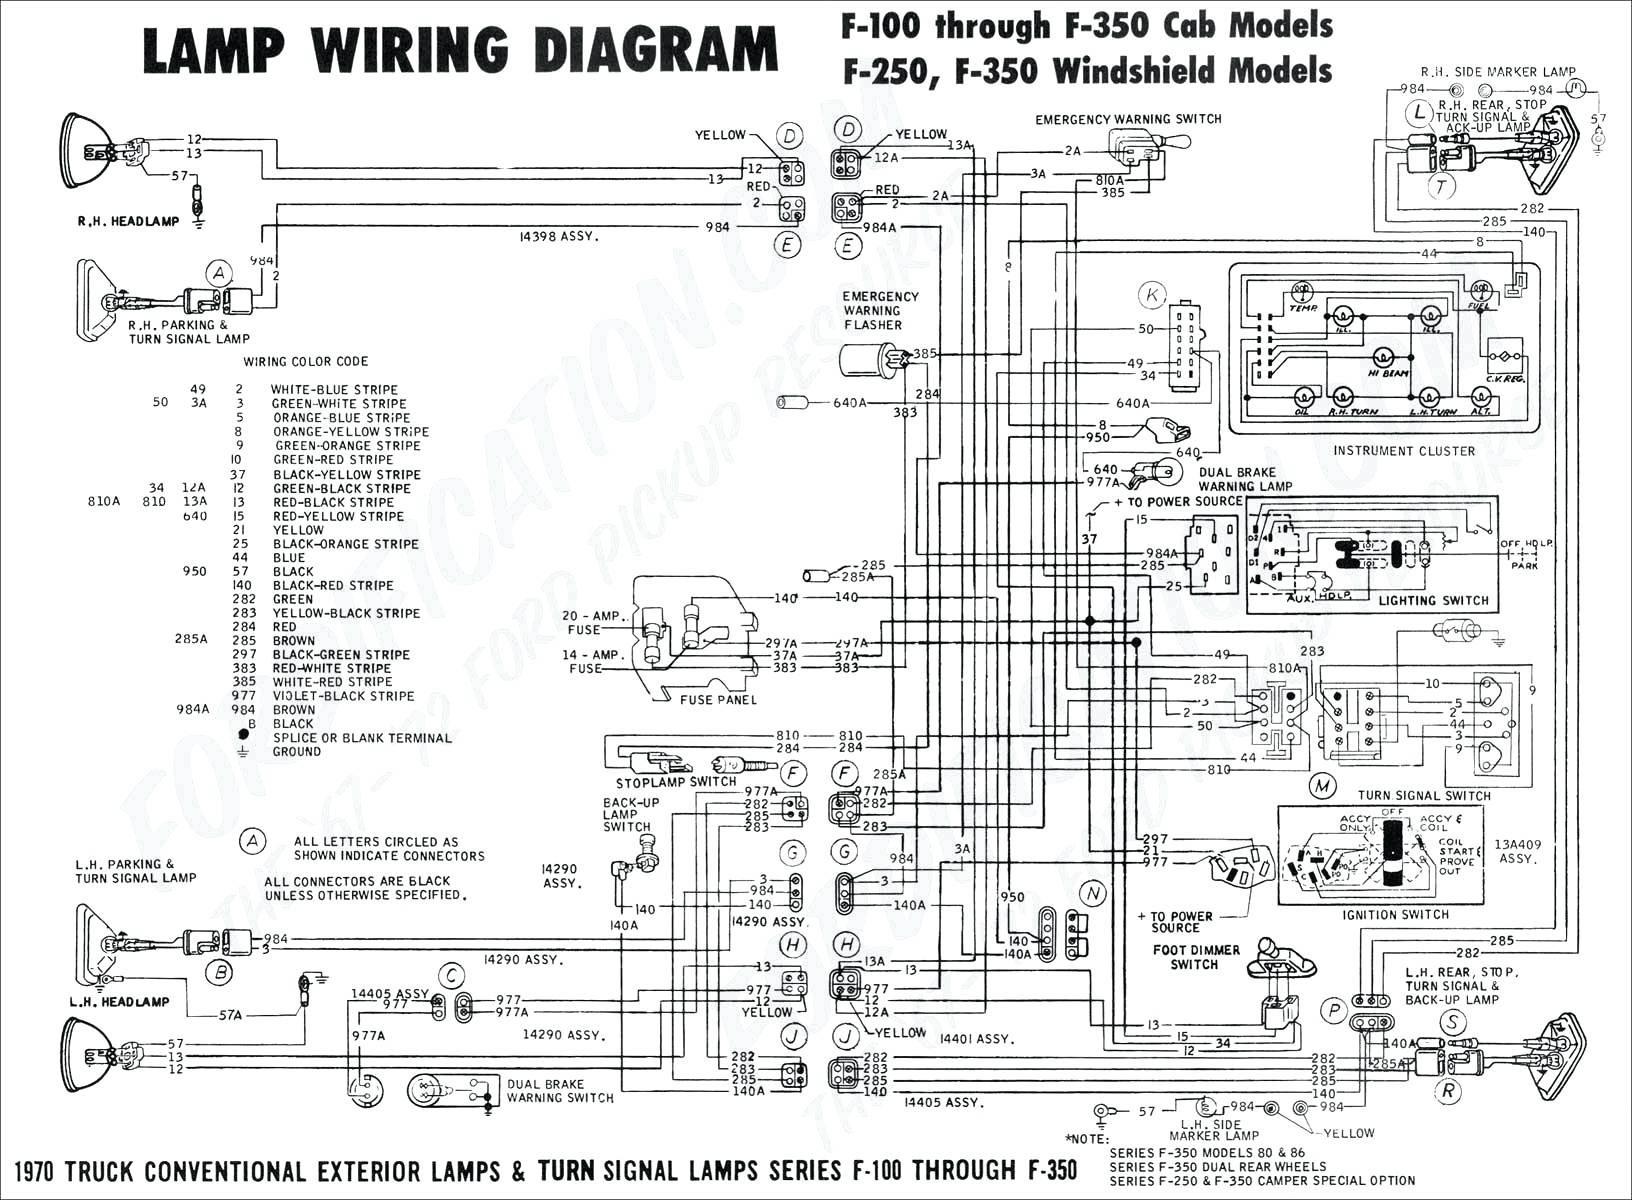 hight resolution of 2007 chrysler sebring wiring diagram f53 motorhome chassis wiring diagram also 1997 chrysler sebring rh